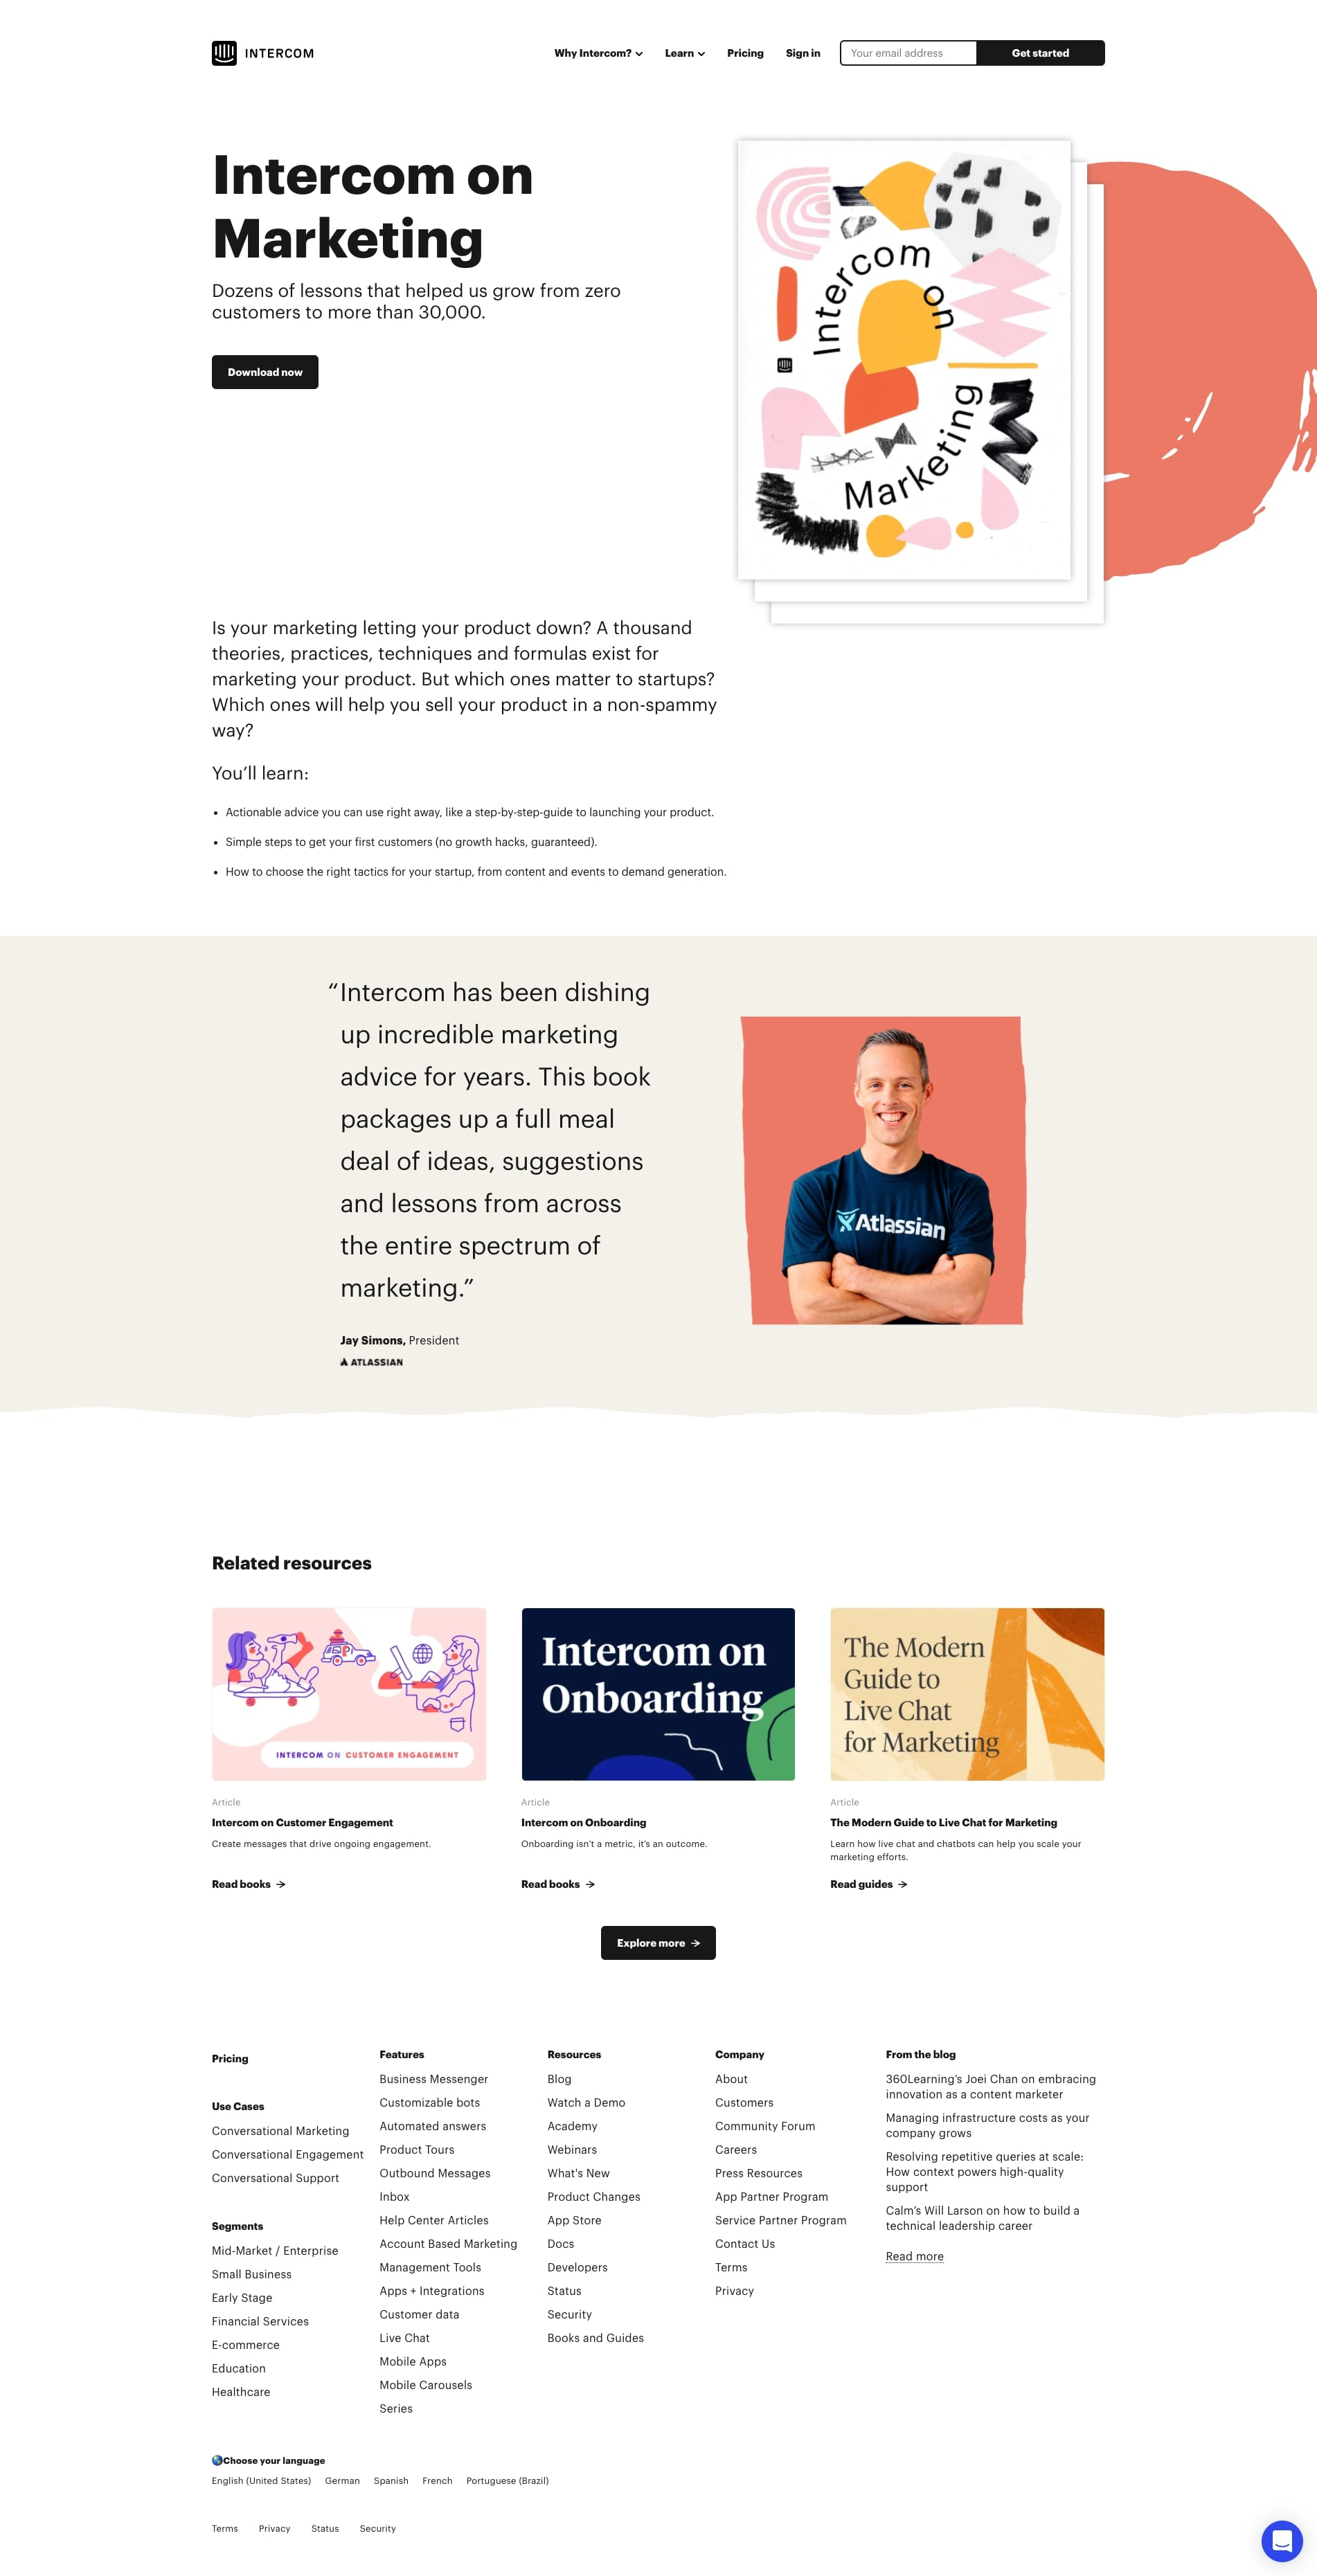 Intercom on marketing ebook landing page